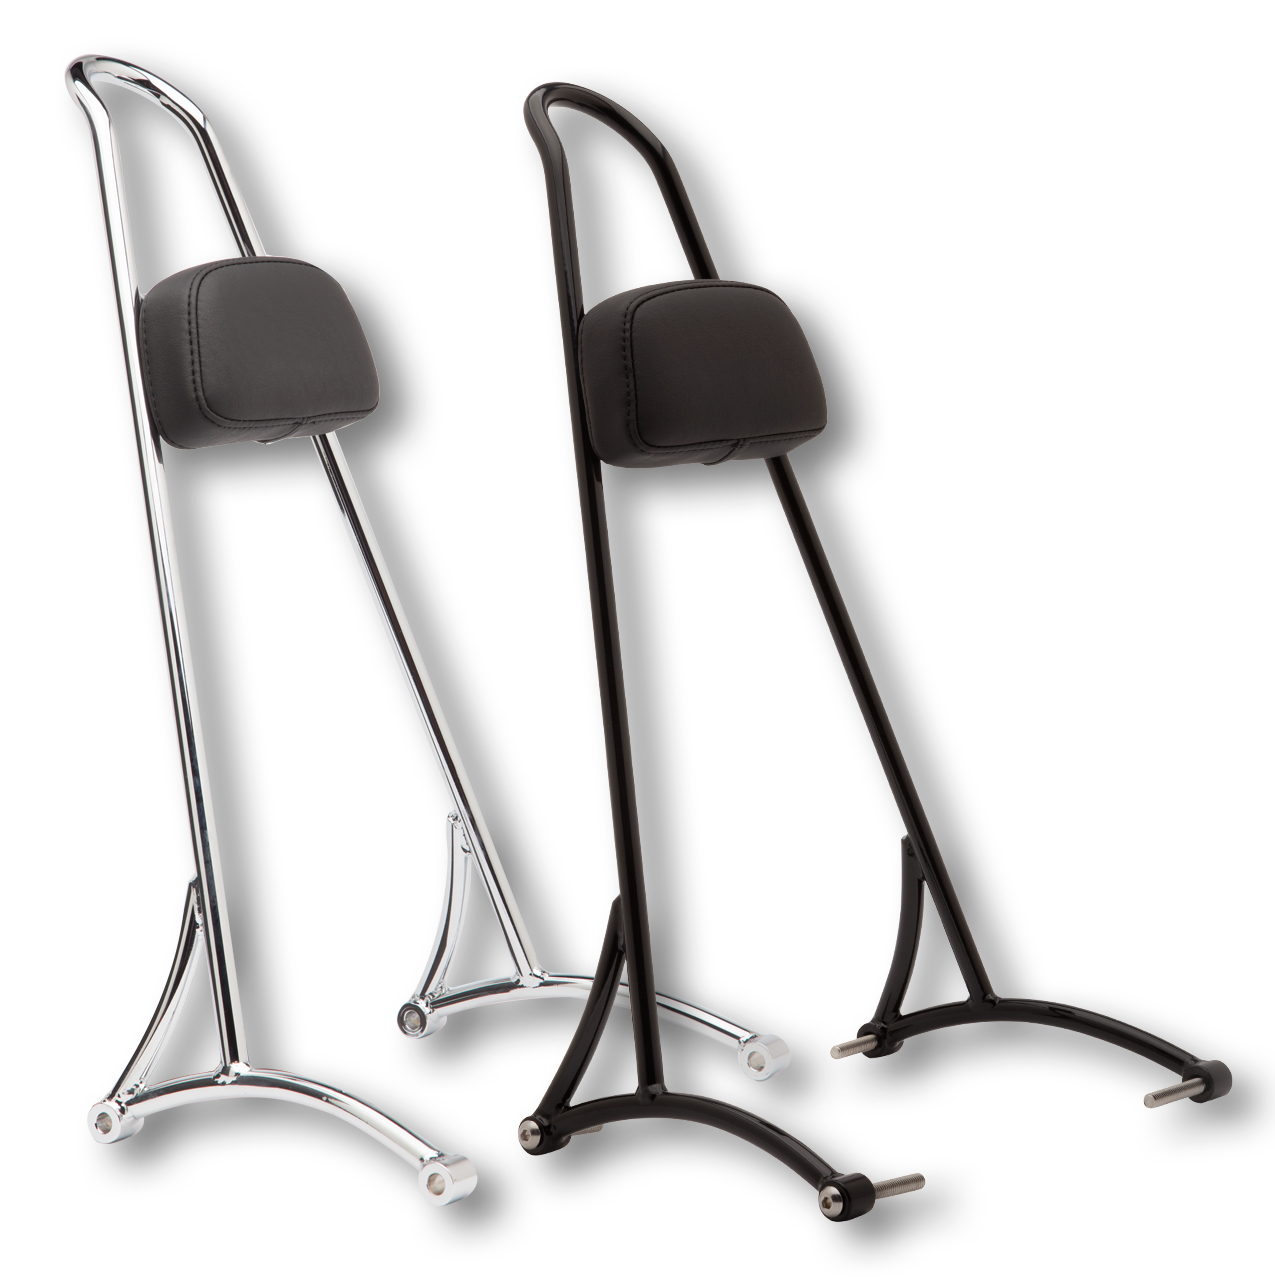 burly brand 20 tall chrome burly sissy bar w pad 04 16 xl. Black Bedroom Furniture Sets. Home Design Ideas